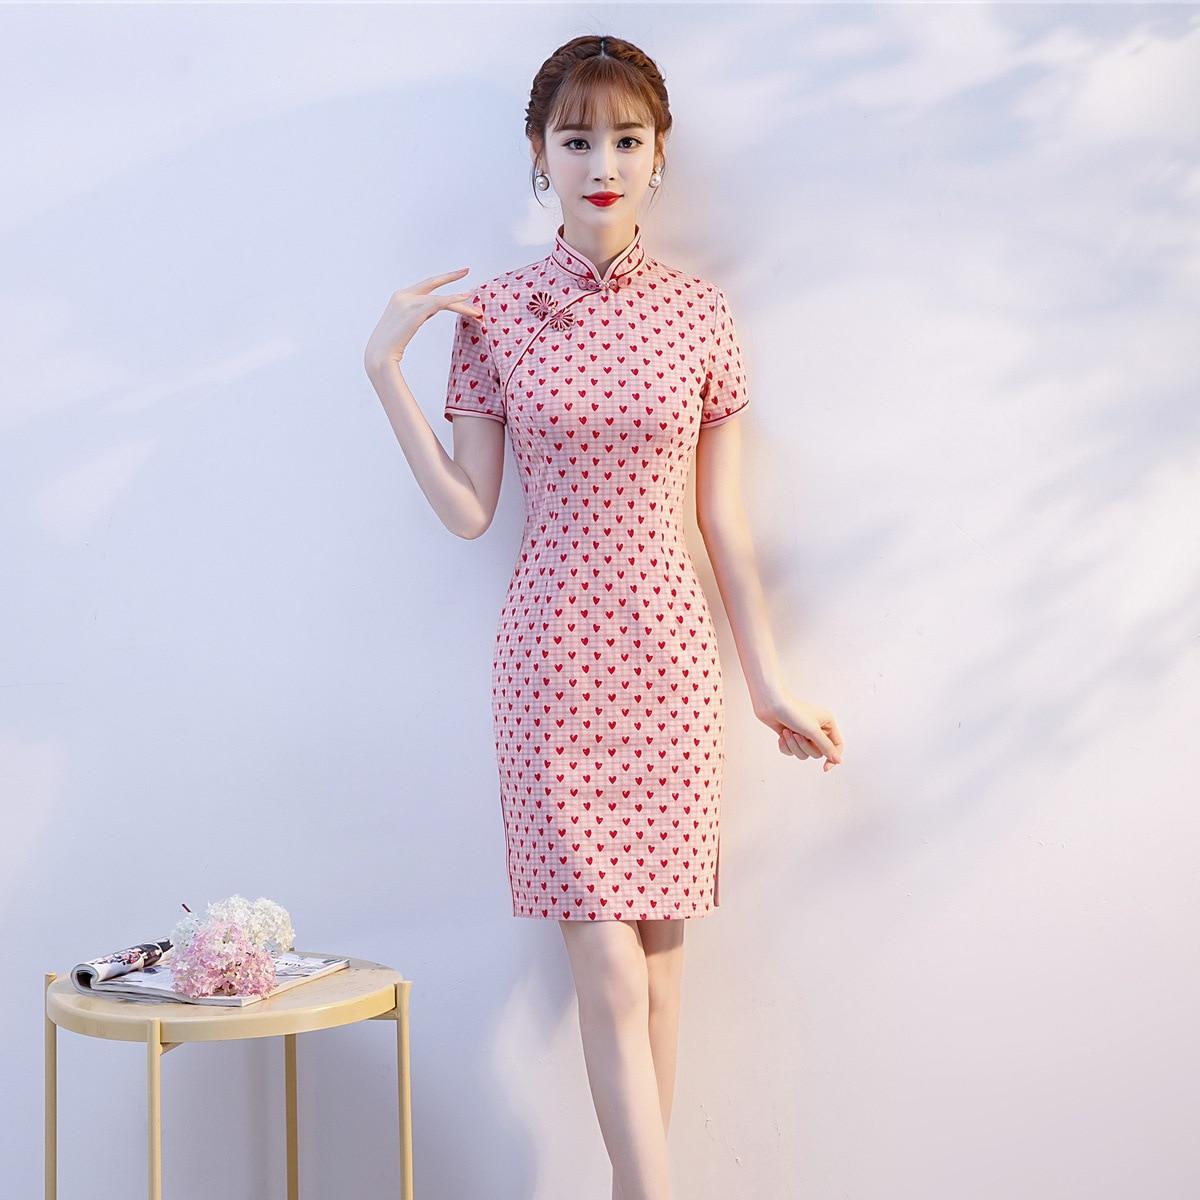 Open Rain 2019 New Style Cotton Linen Short Cheongsam Pink And Blue Heart Years Situation GIRL'S Cheongsam Dress Short Elegant